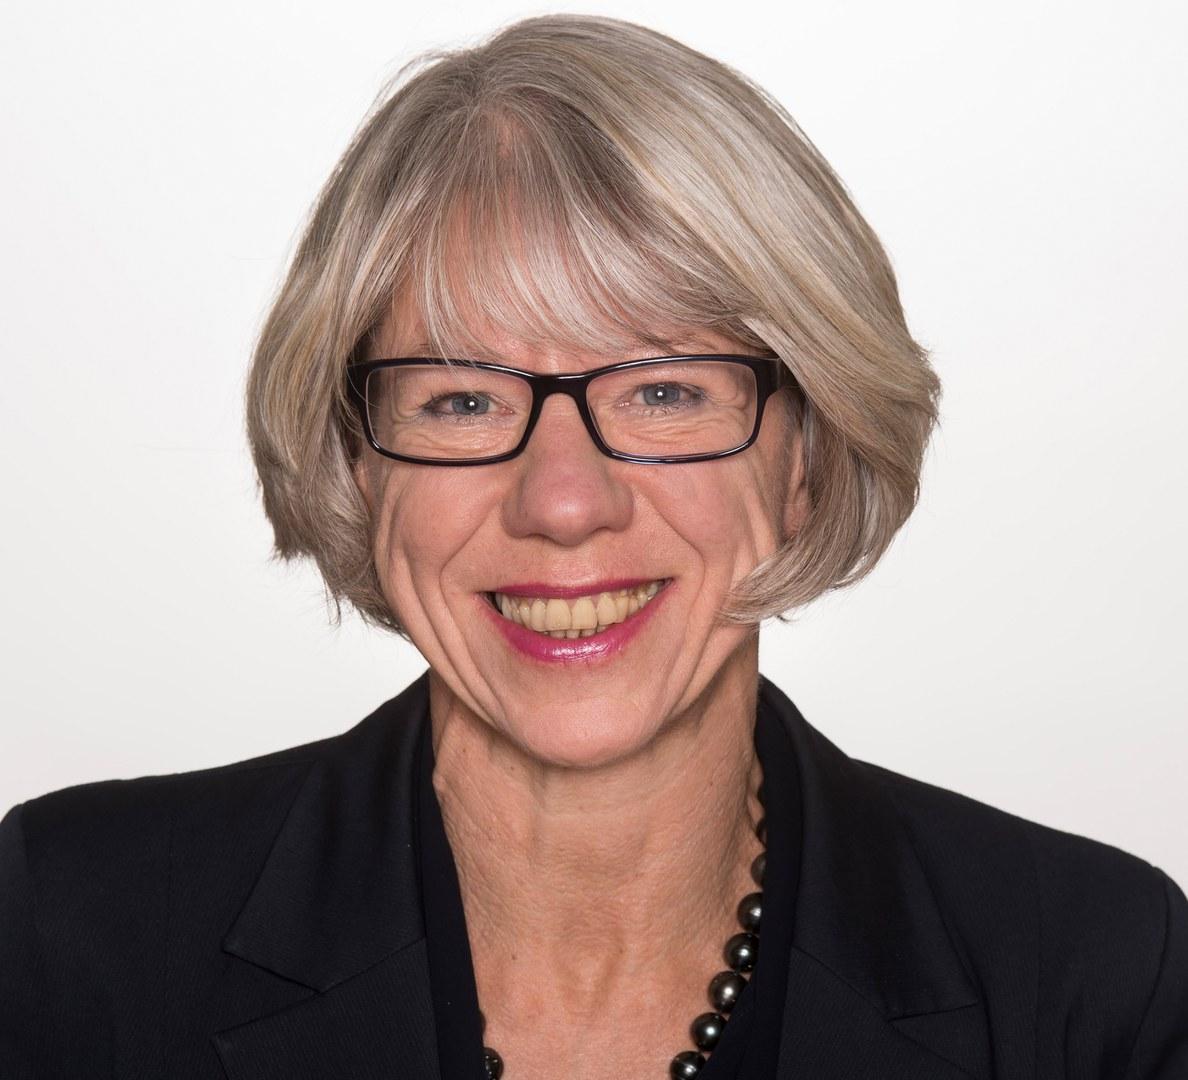 Prof. Dr. Sabine Sielke